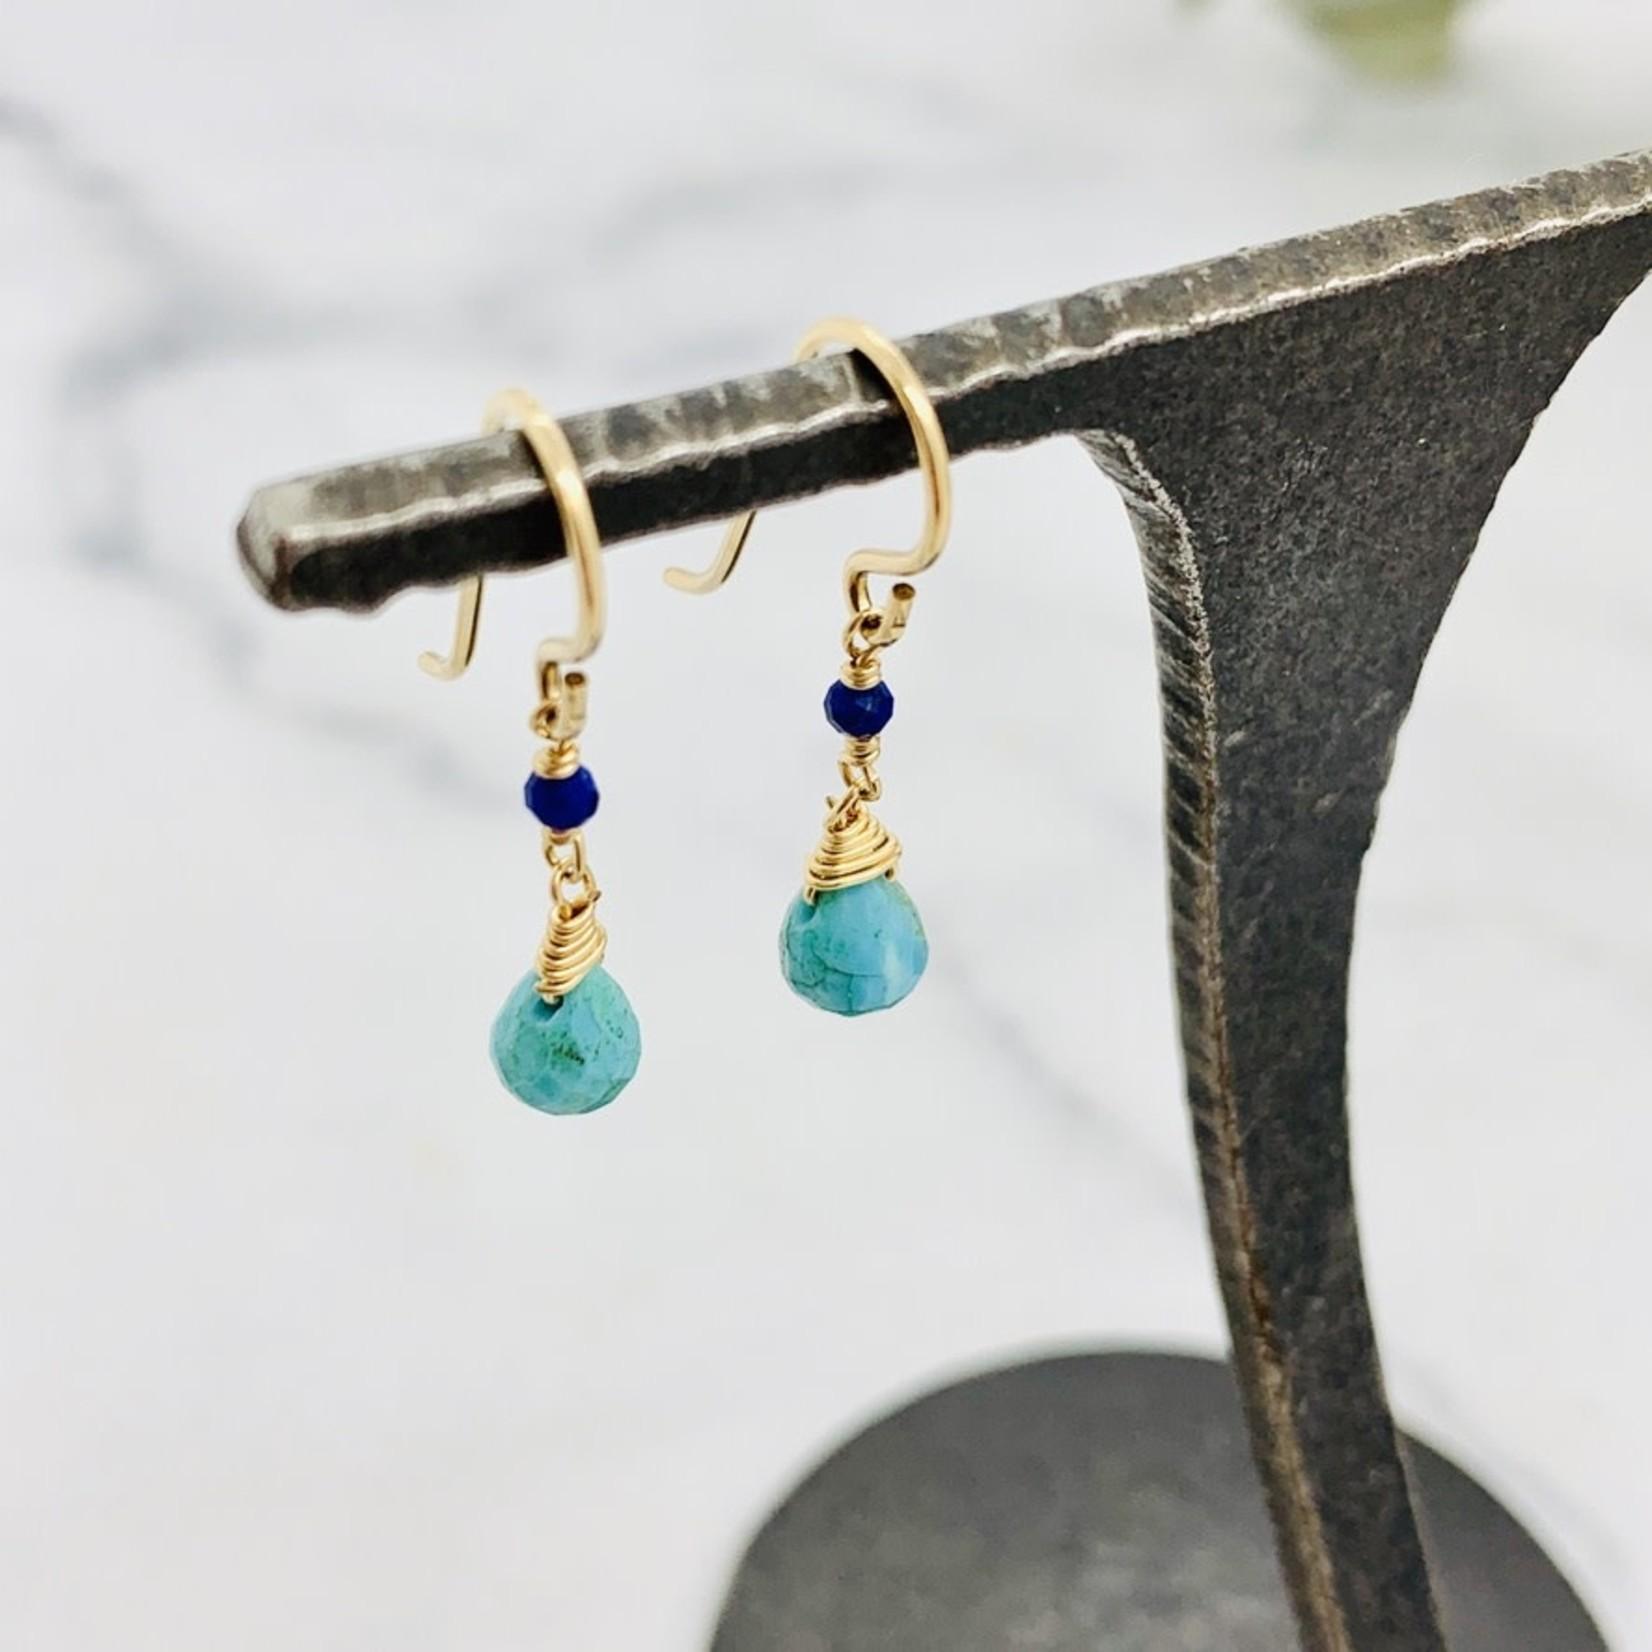 Handmade earrings with turquoise briolette, lapis, 14 k g.f.